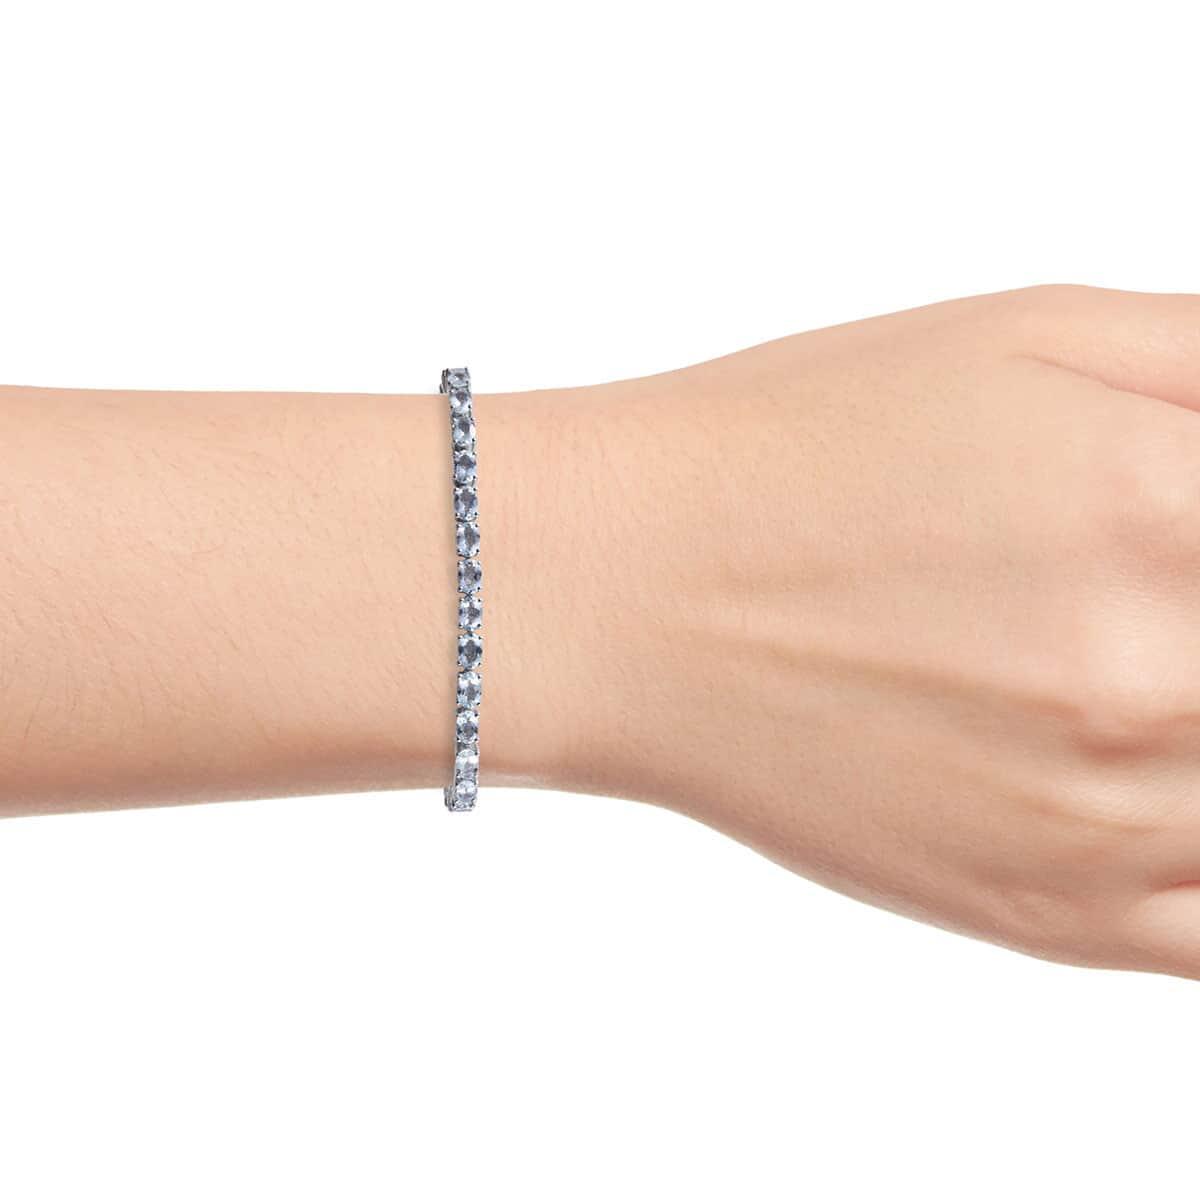 Espirito Santo Aquamarine Platinum Over Sterling Silver Bracelet (7.25 In) TGW 9.82 cts.